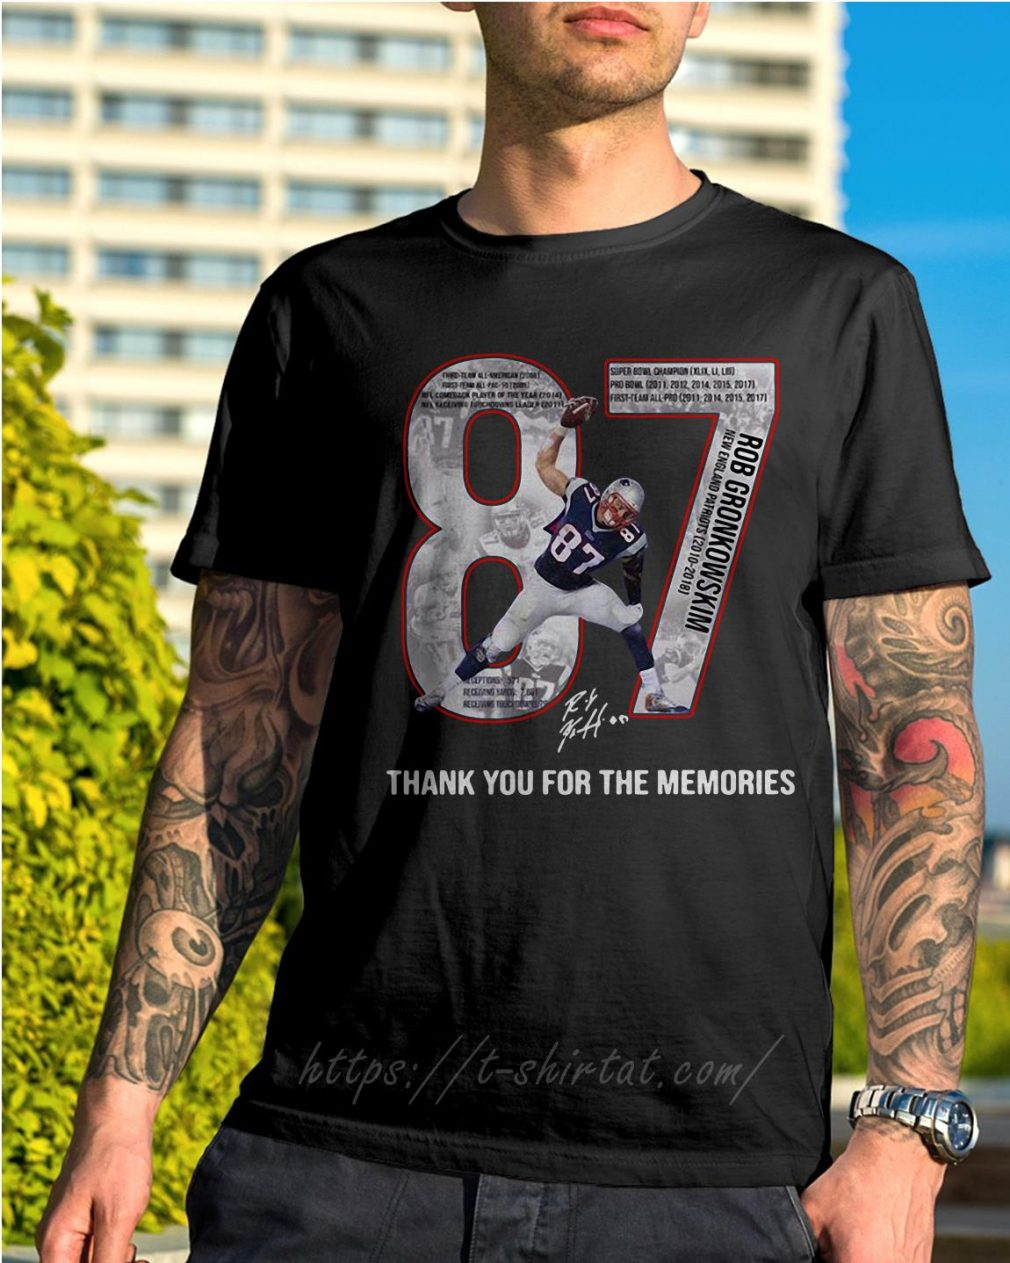 New England Patriots Rob Gronkowski 87 thank you for the memories shirt